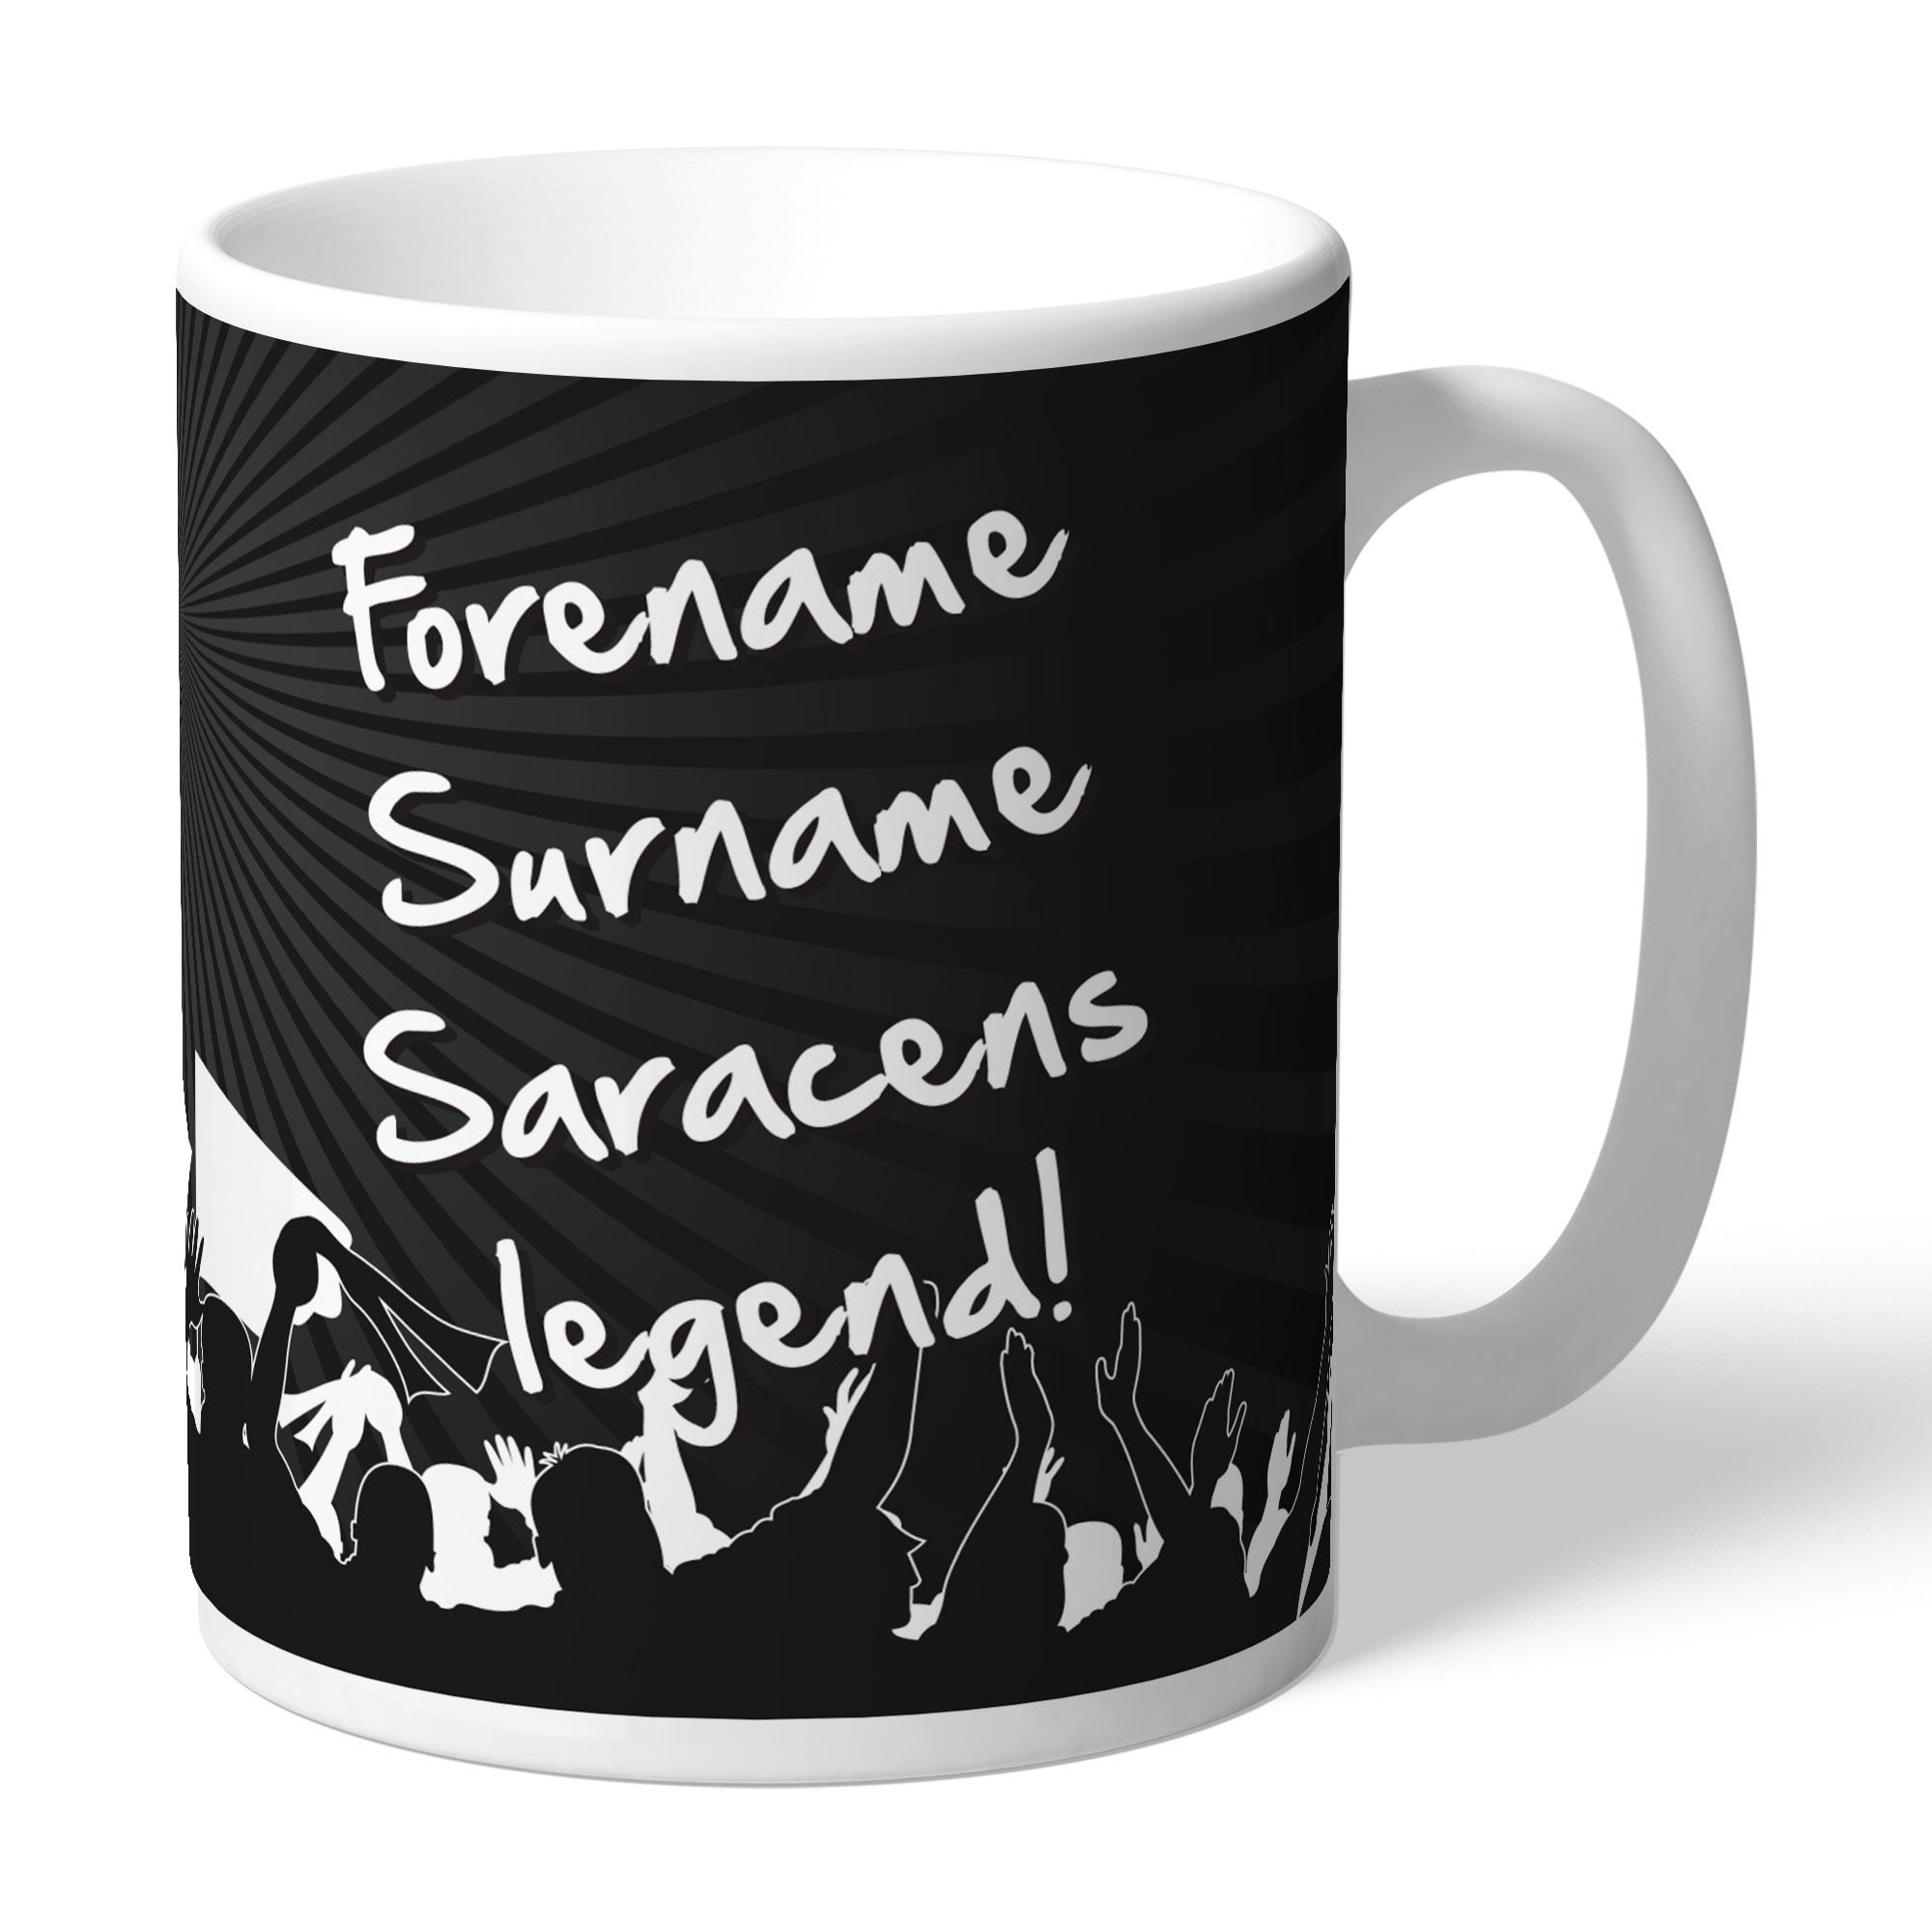 Saracens Legend Mug